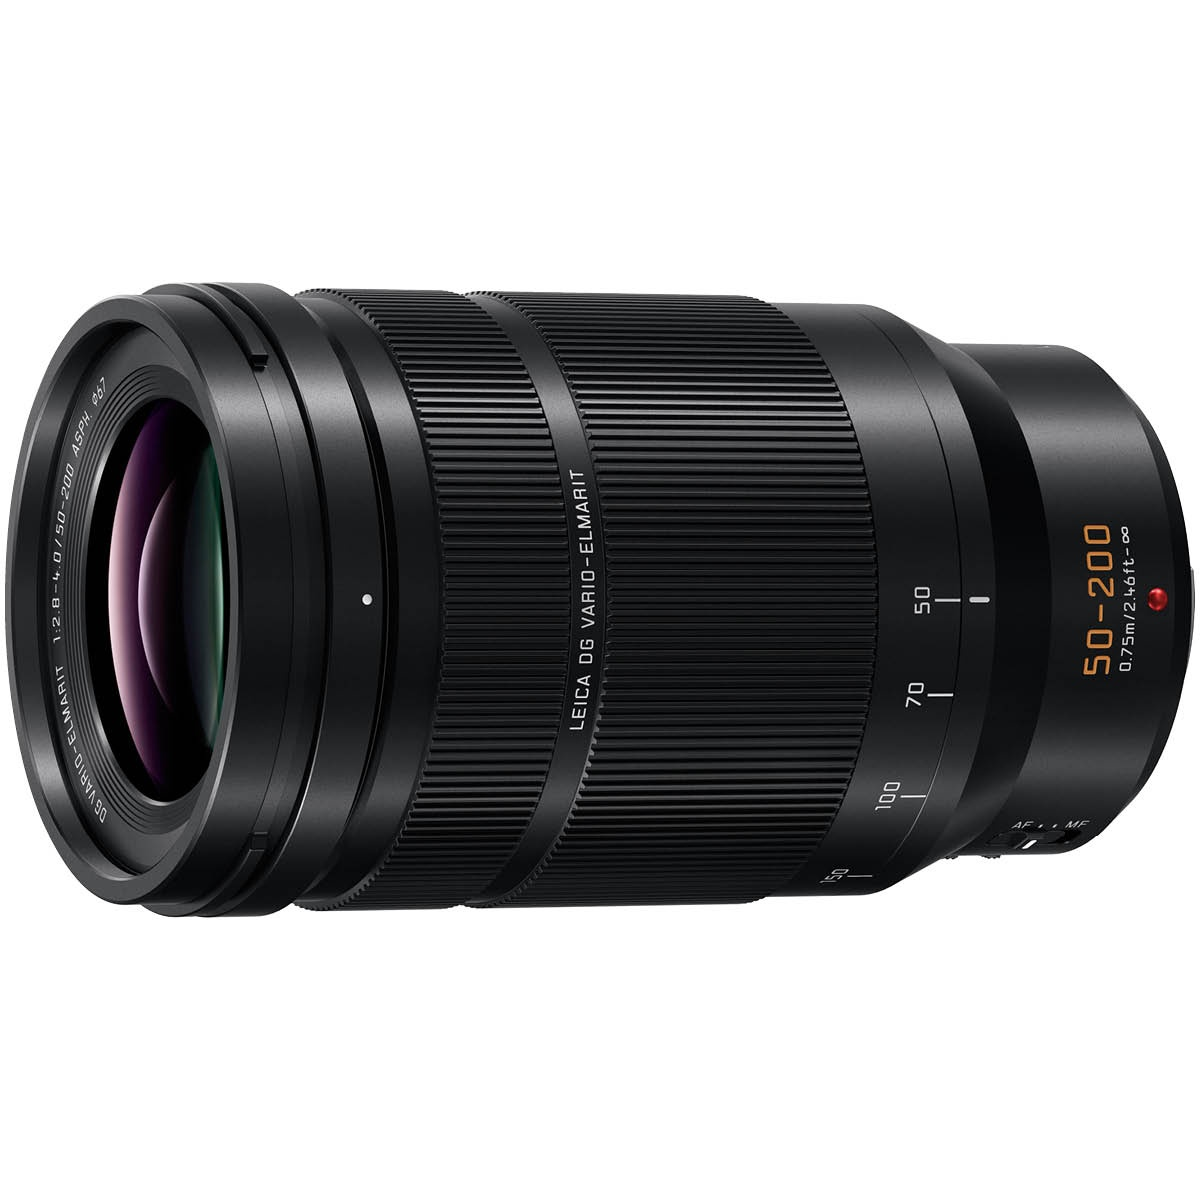 Panasonic 50-200 mm 1:2,8-4,0 OIS Leica